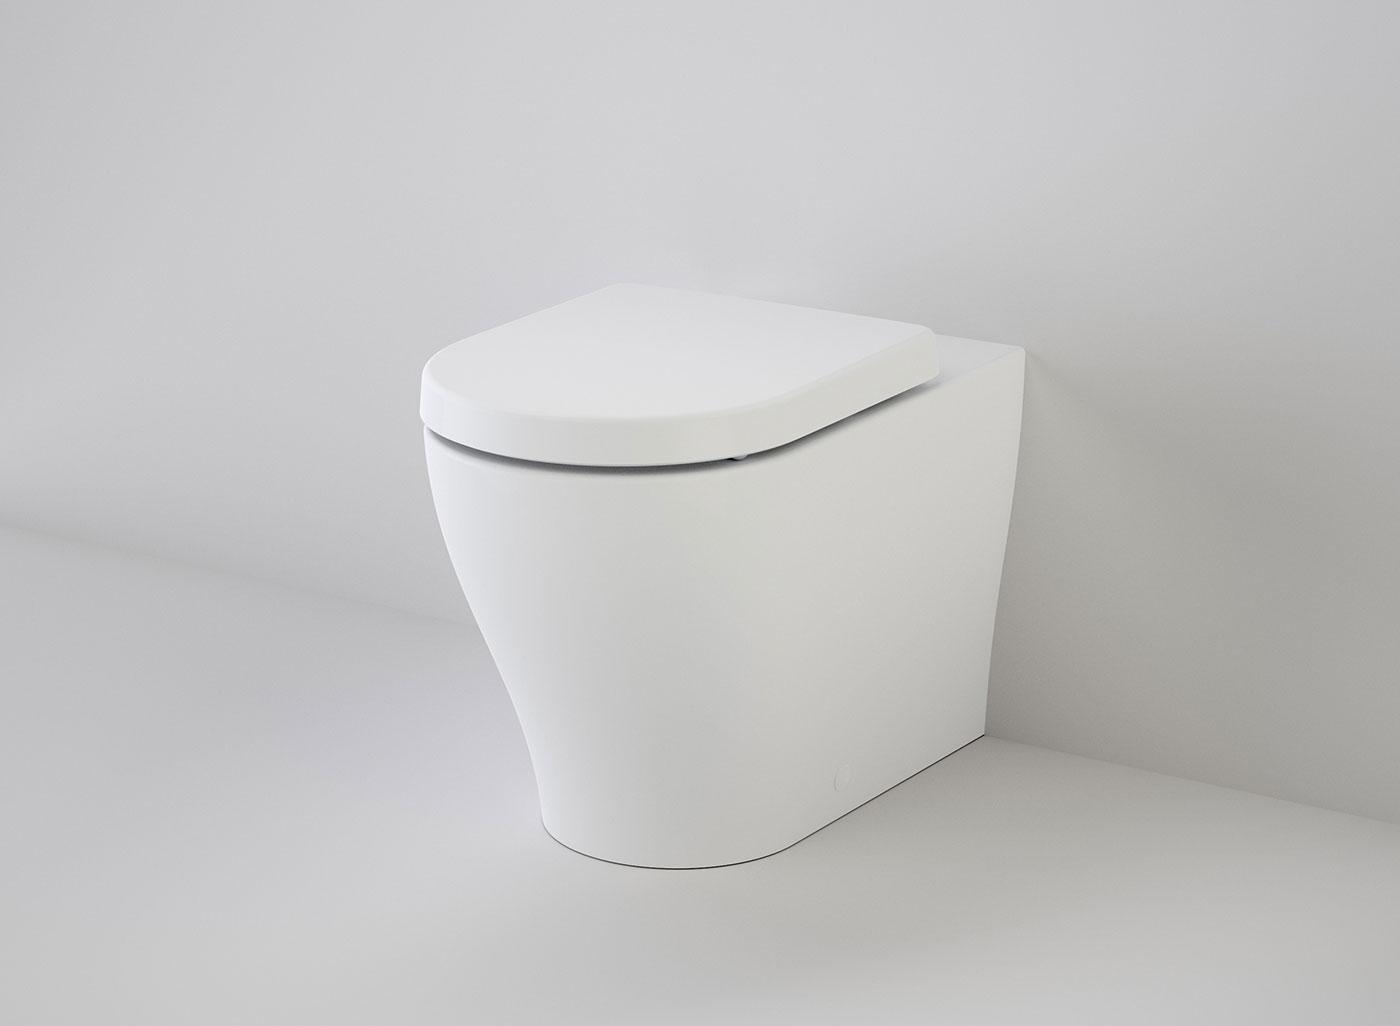 luna cleanflush invisi ii wall faced toilet suite soft close 3